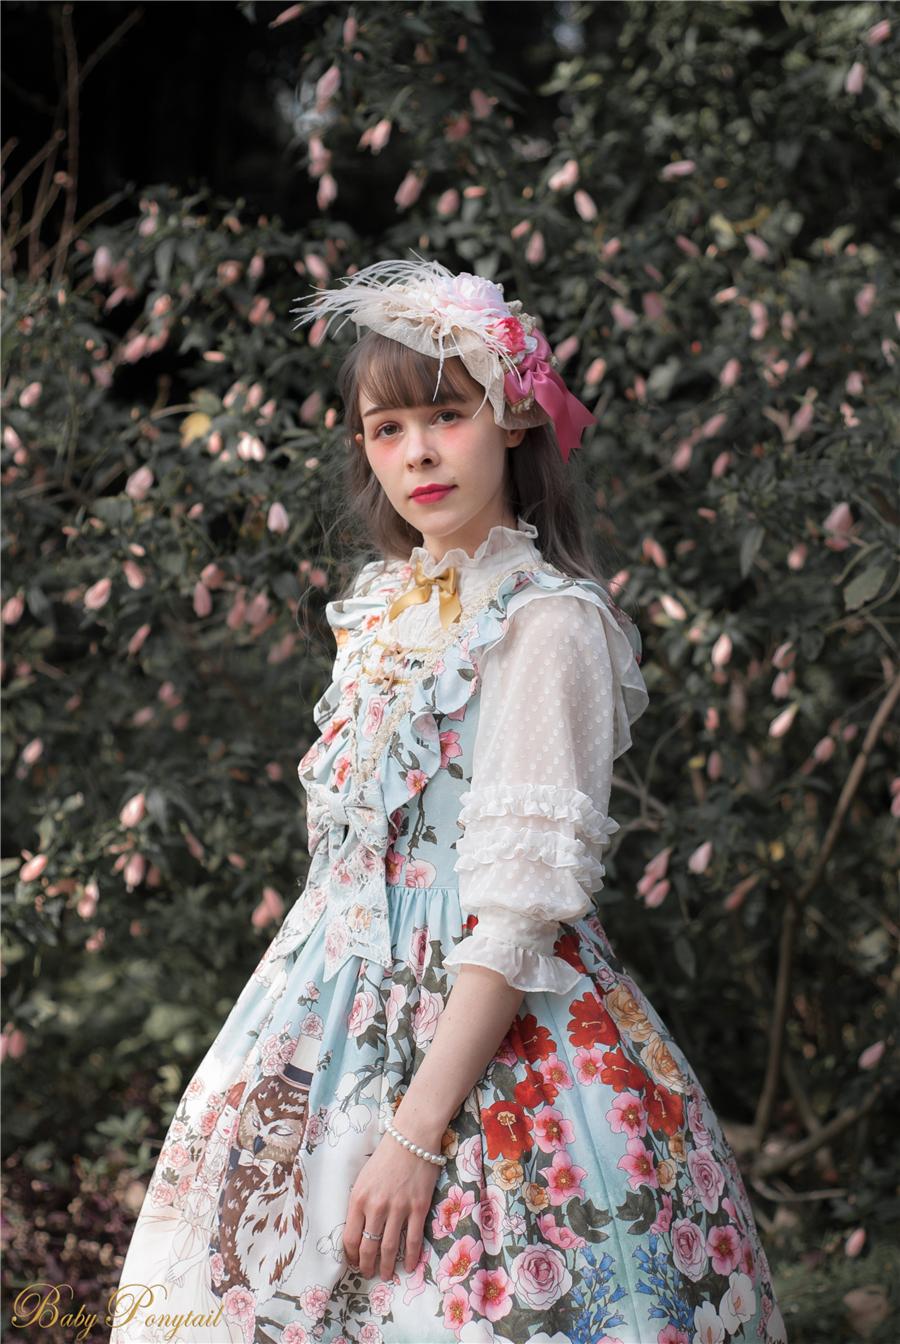 Baby Ponytail_Model Photo_Polly's Garden of Dreams_JSK Sky_Claudia19.jpg